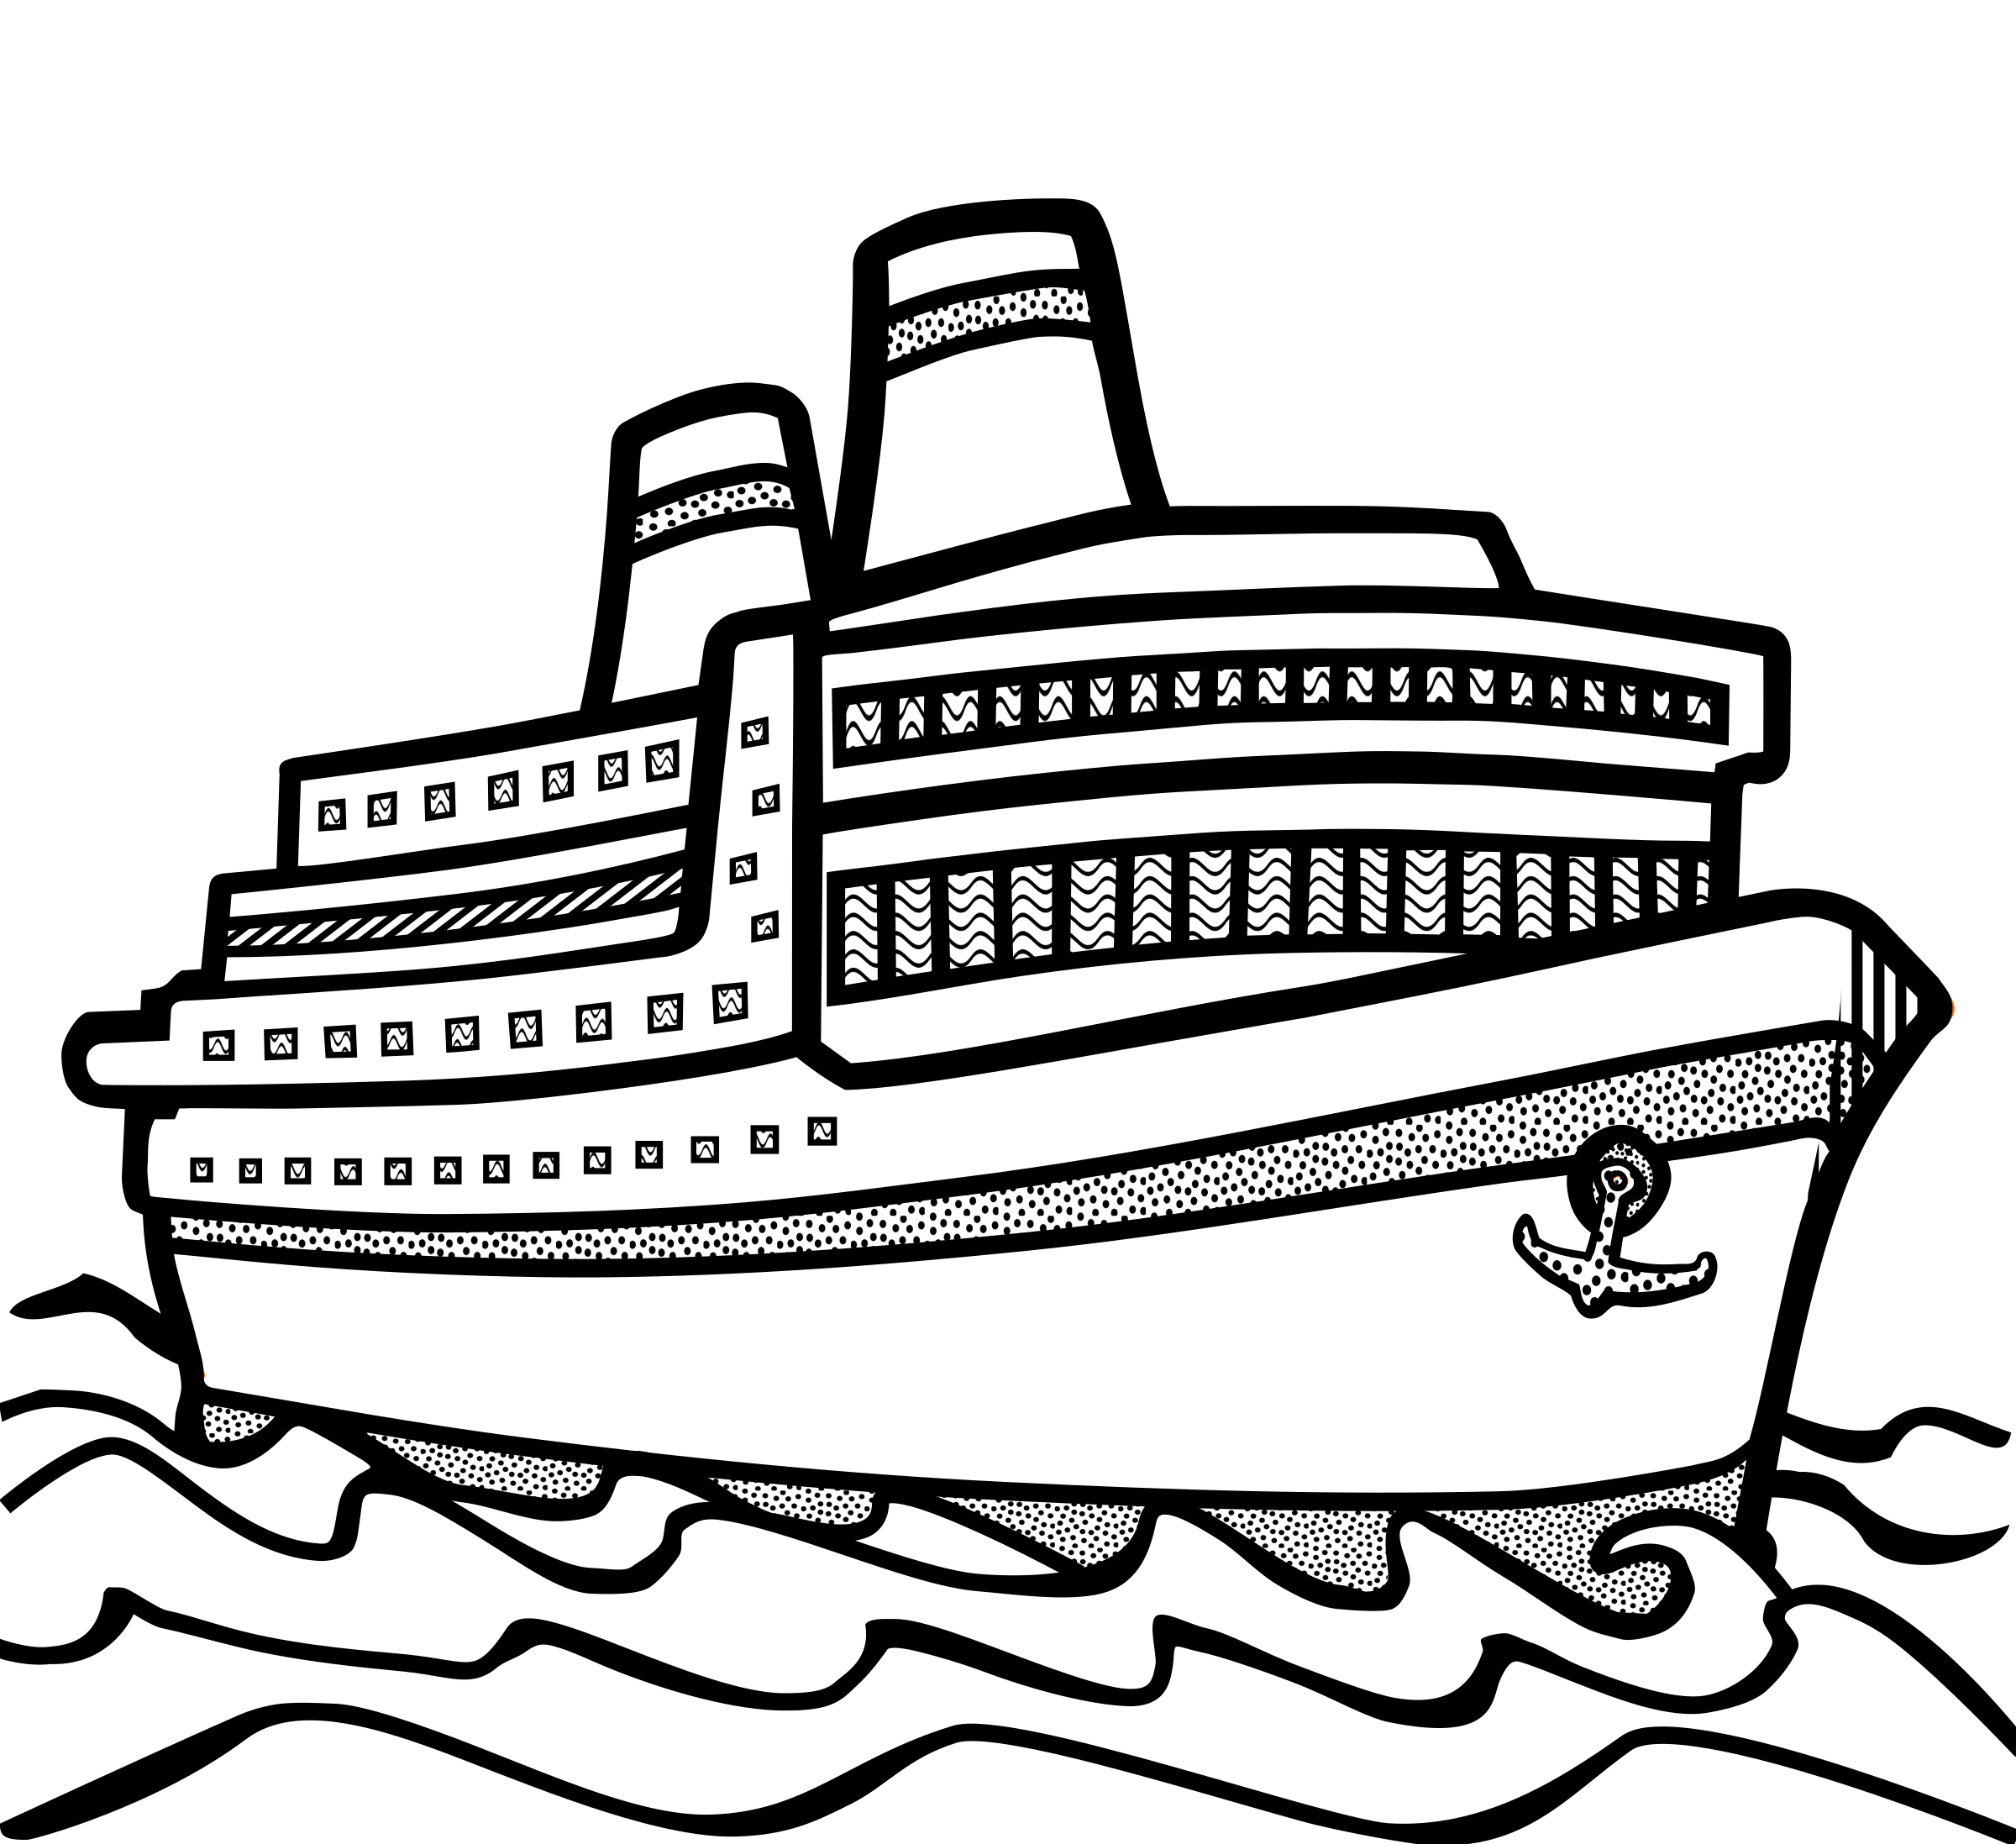 I clipart ship, Picture #1389679 i clipart ship.